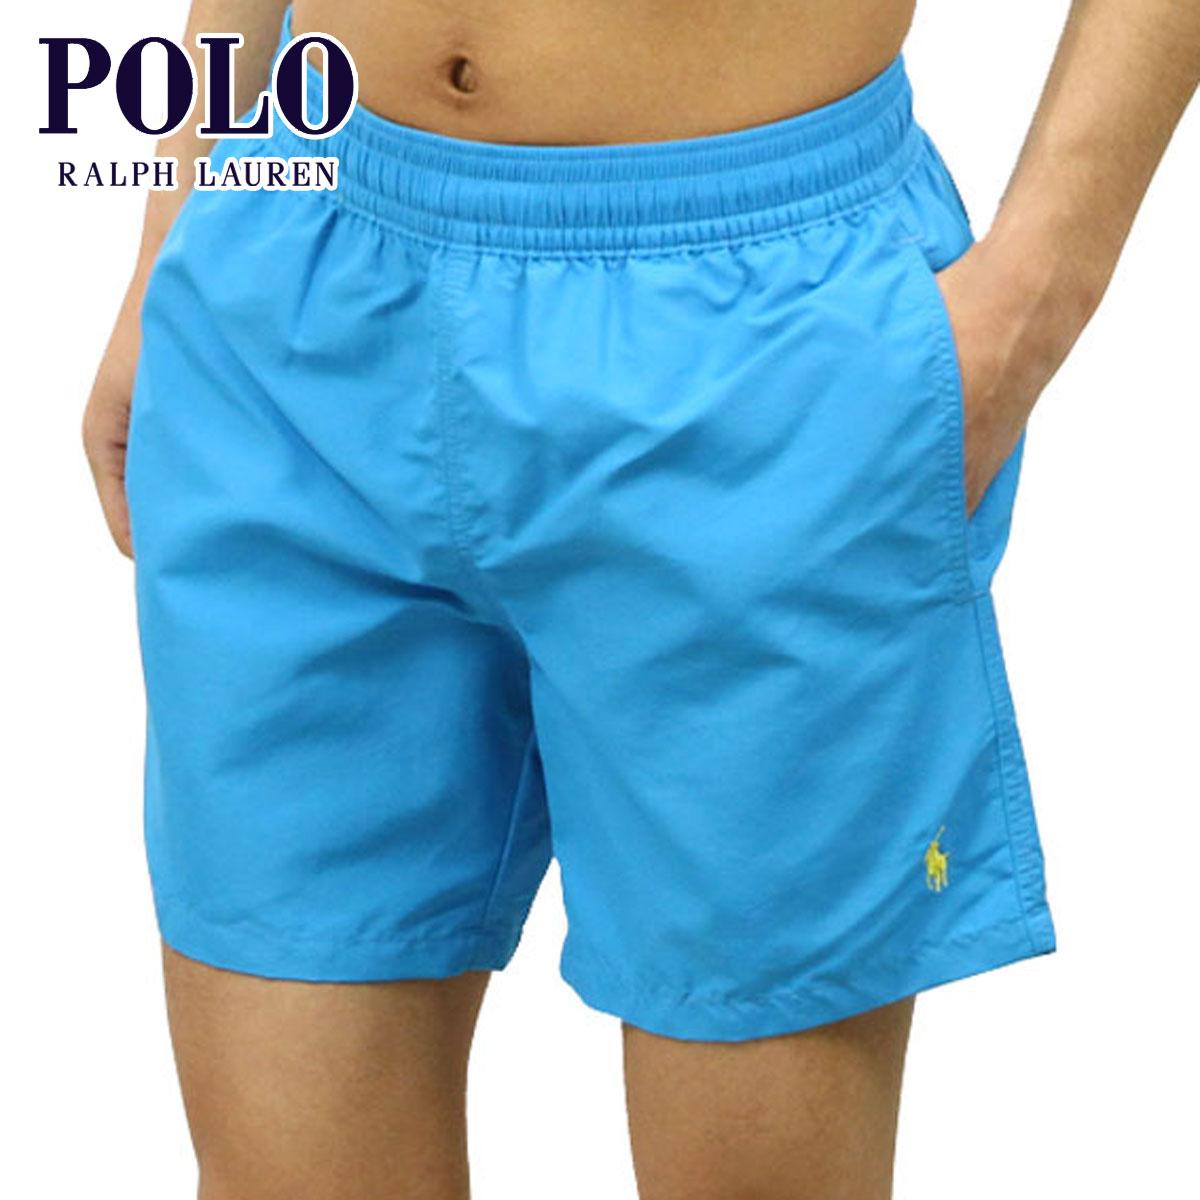 66592a3edc Rakuten Ichiba shop MIXON: Polo Ralph Lauren POLO RALPH LAUREN regular  article men swimsuit swimming underwear 5 1/2-INCH HAWAIIAN SWIM TRUNK |  Rakuten ...